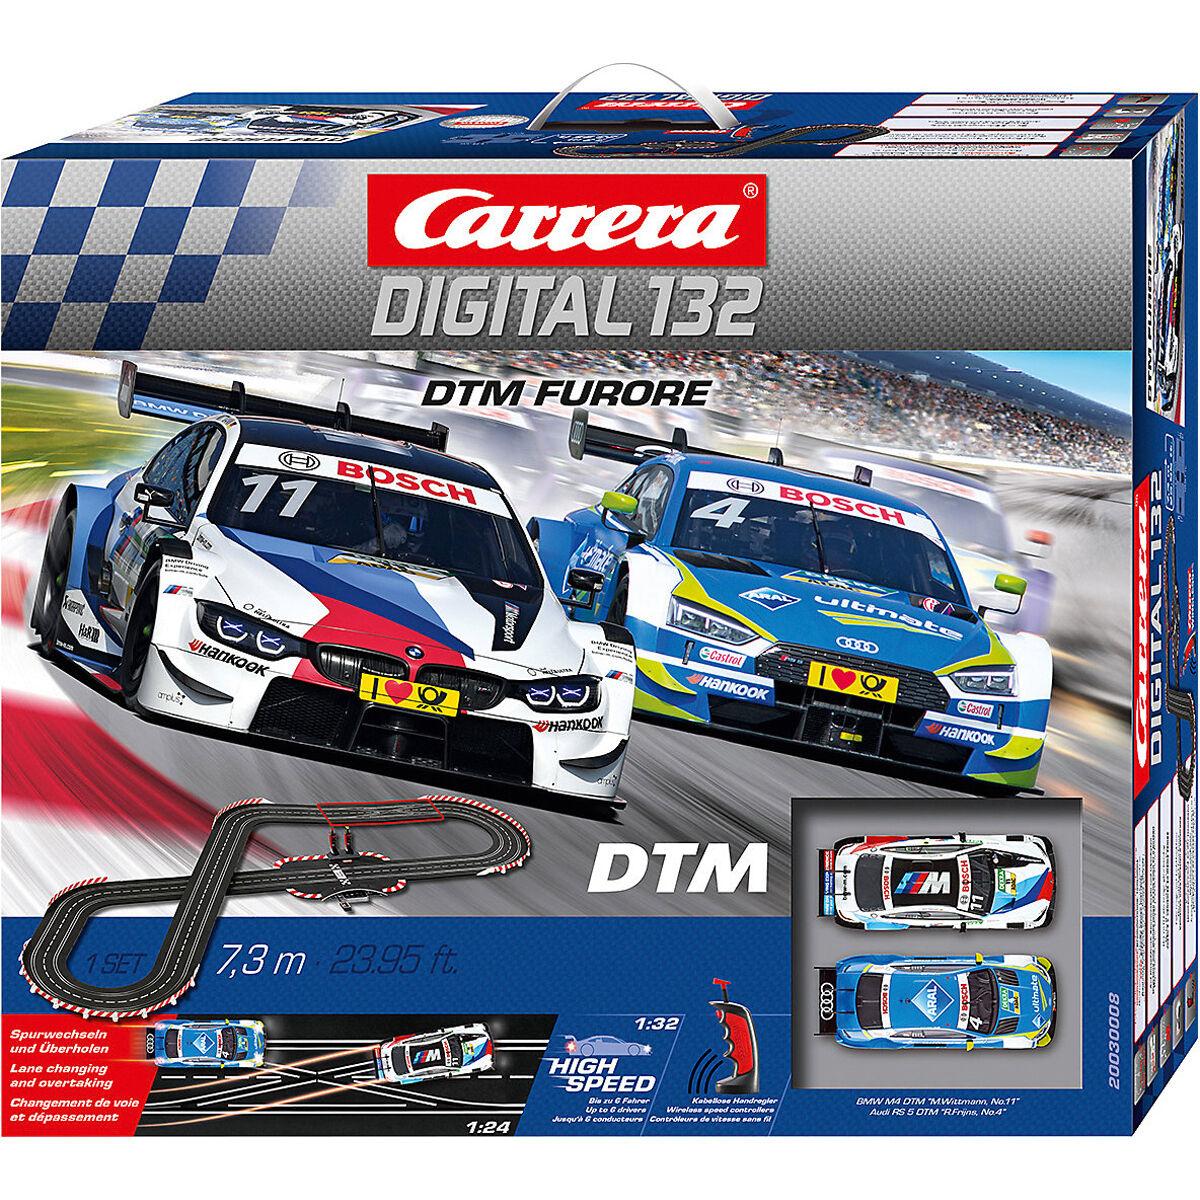 Carrera Digital 132 Startpackung DTM-Furore (30008) bei Galeria.de